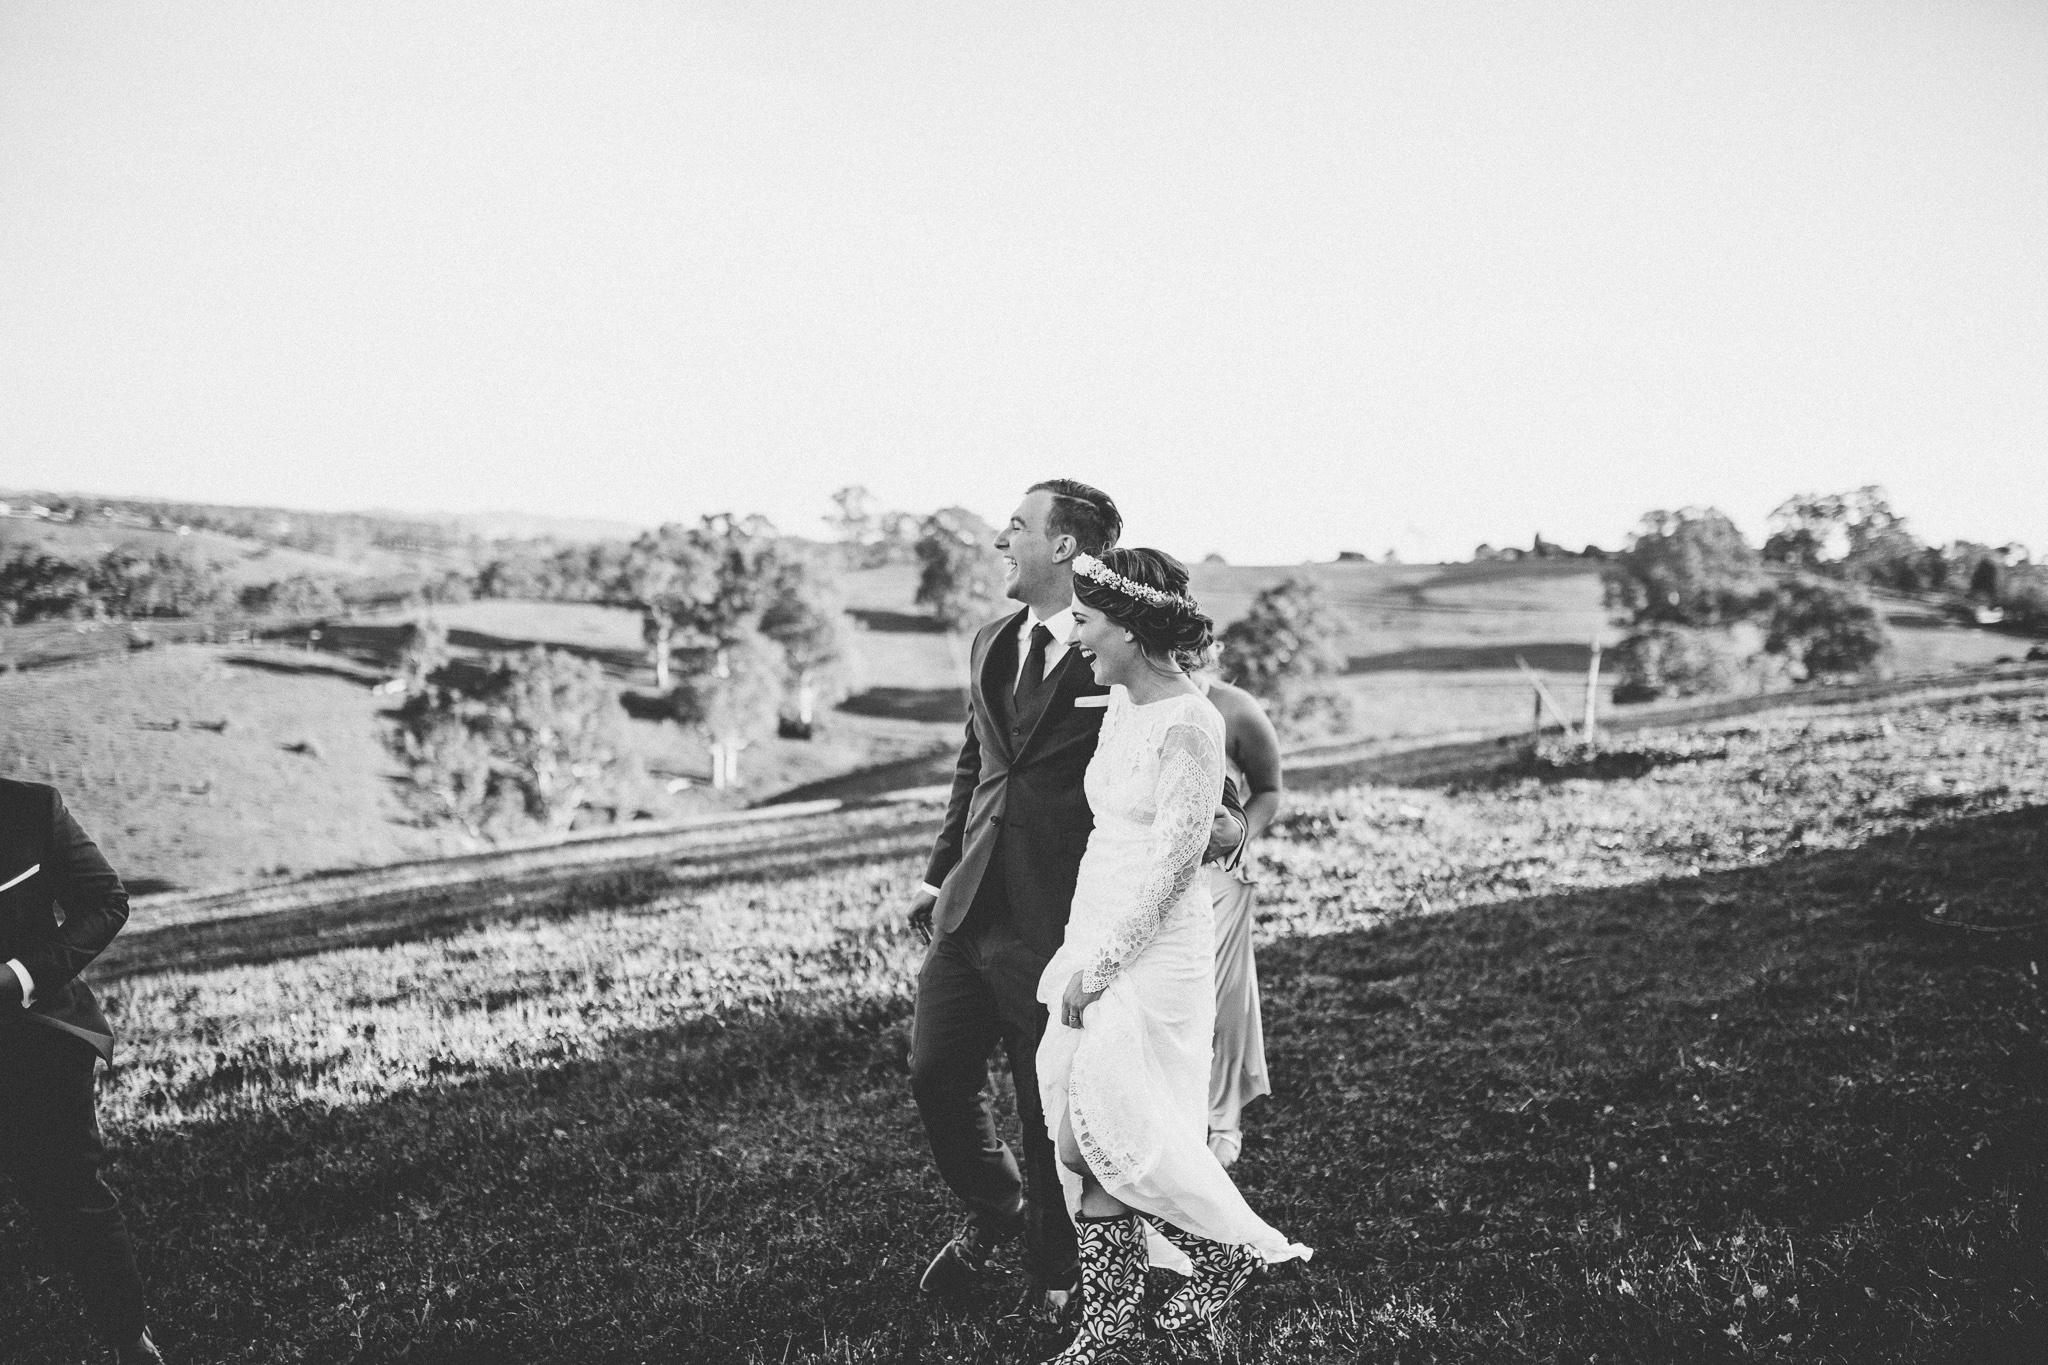 christopher morrison_adelaide hills wedding_ andy + teegan_57_9903.jpg